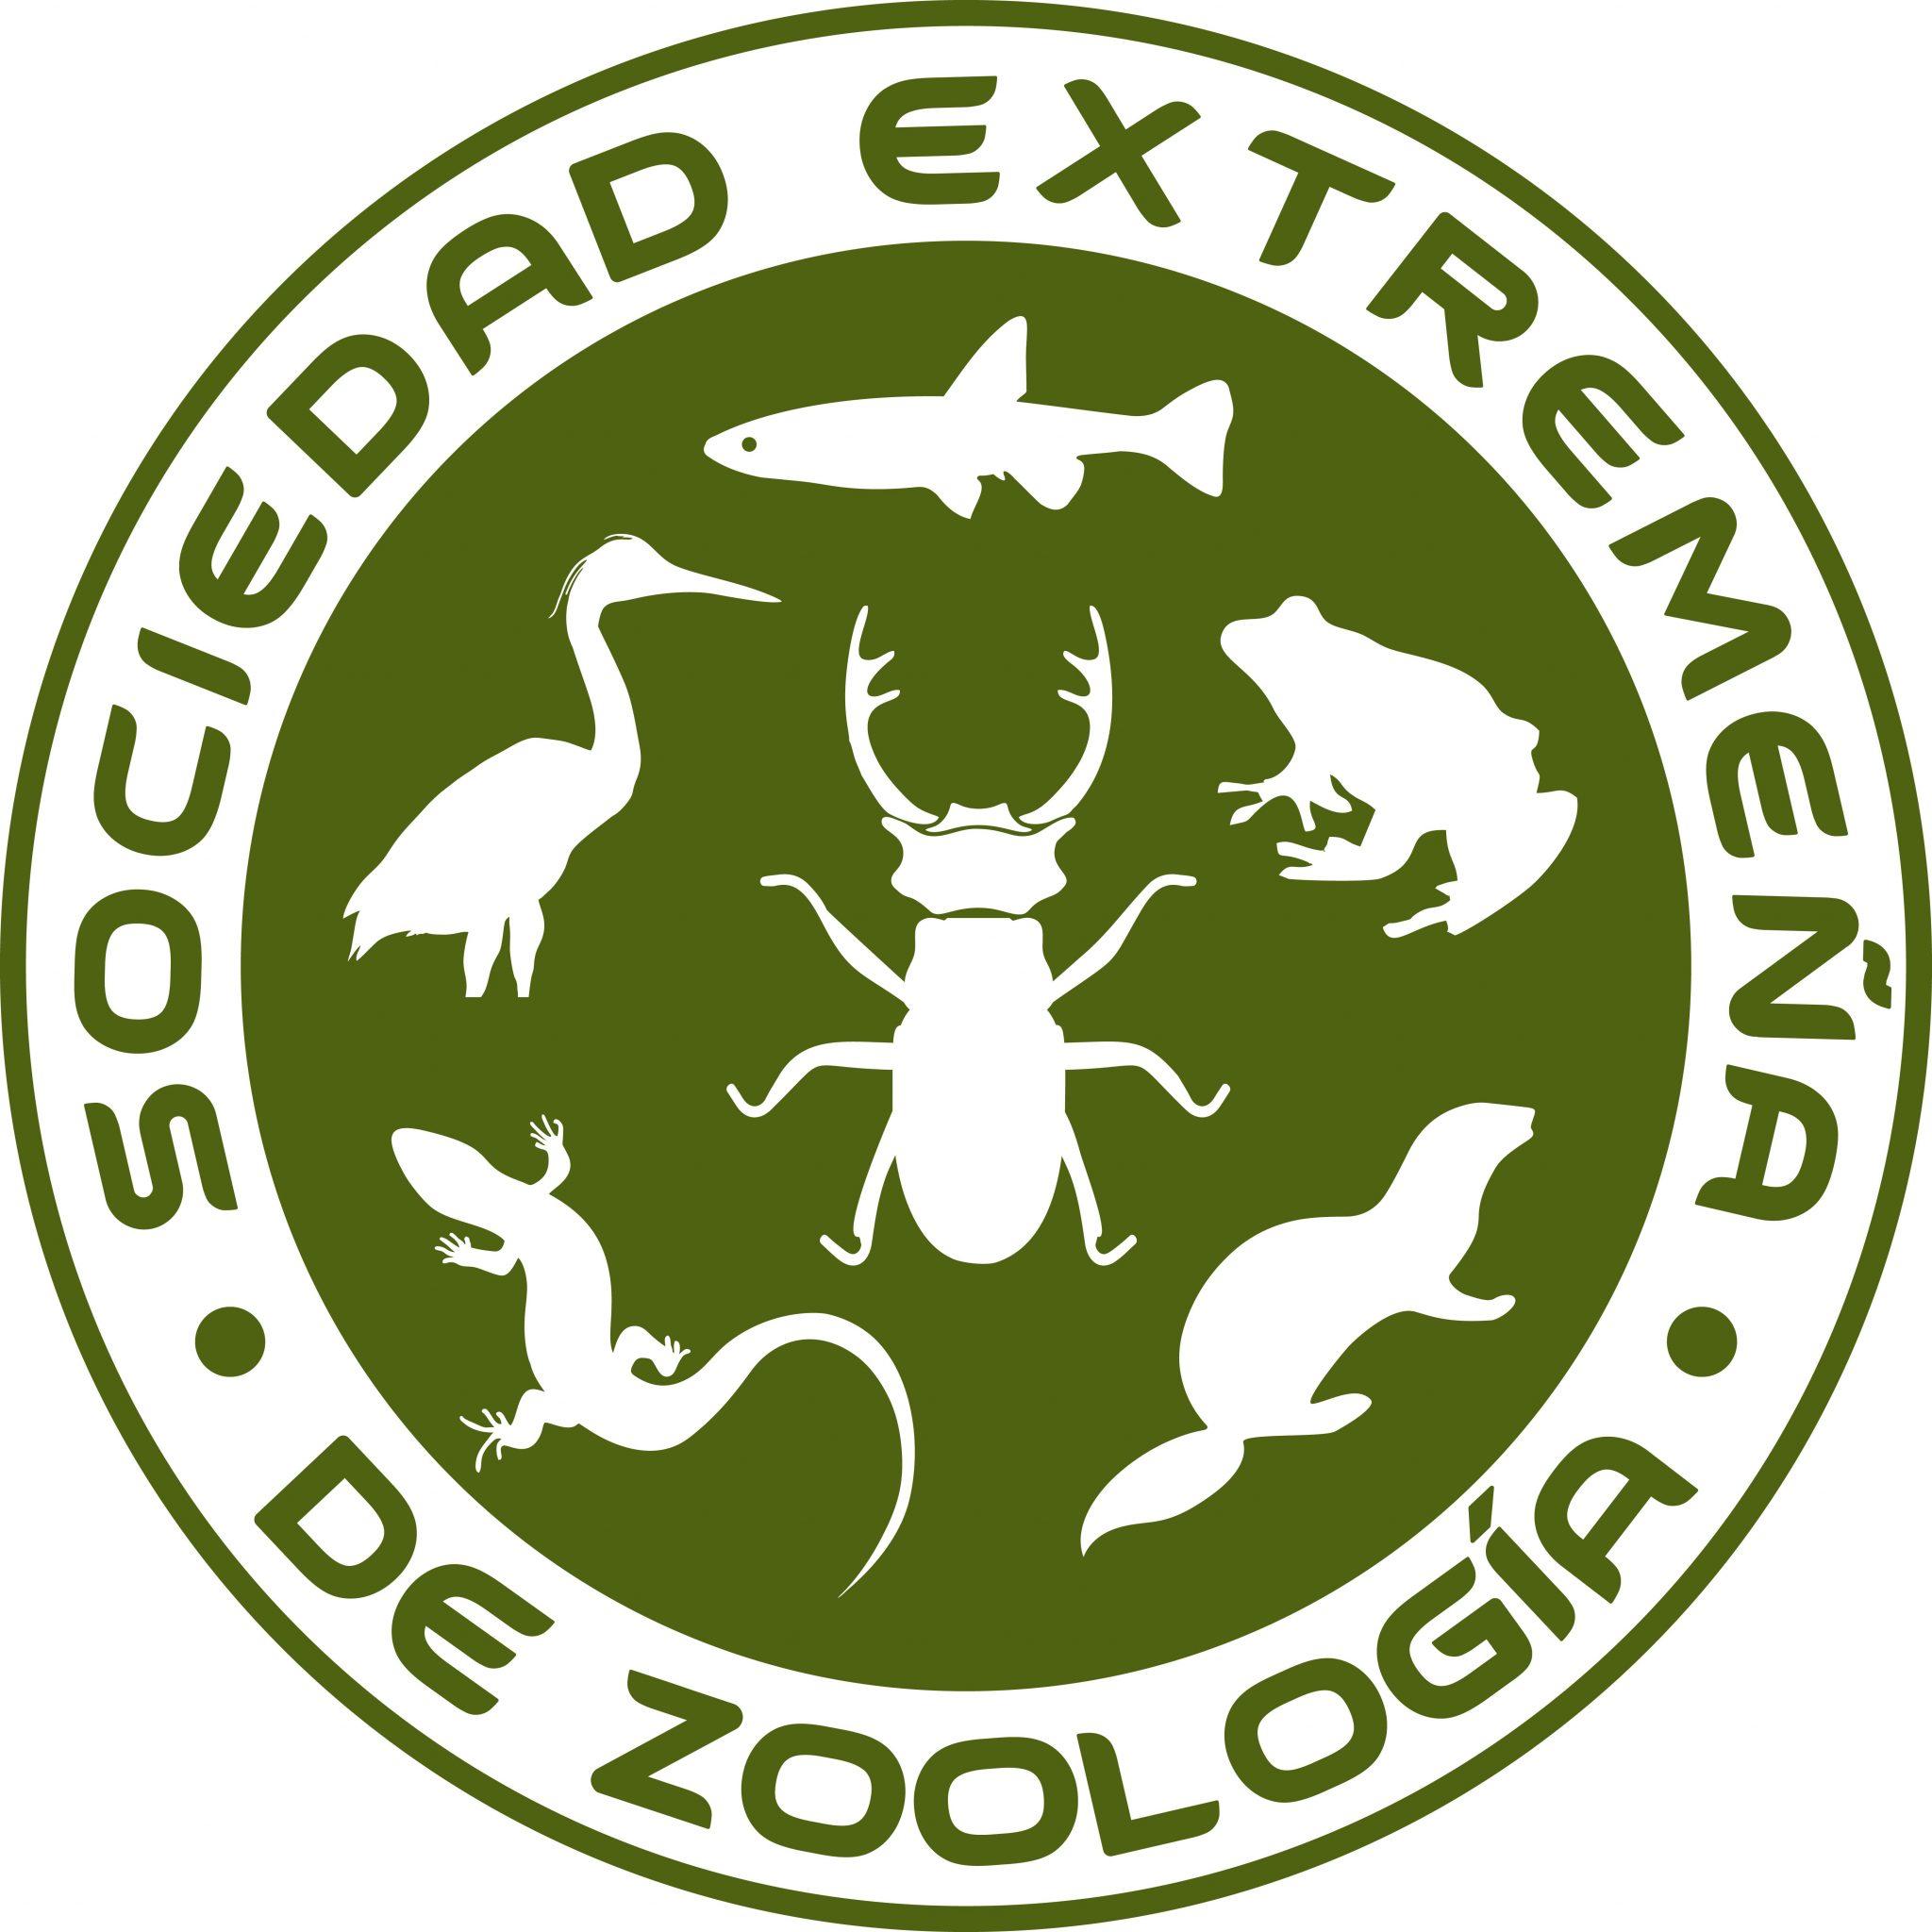 Sociedad Extremeña Zoologia logo masa.cdr